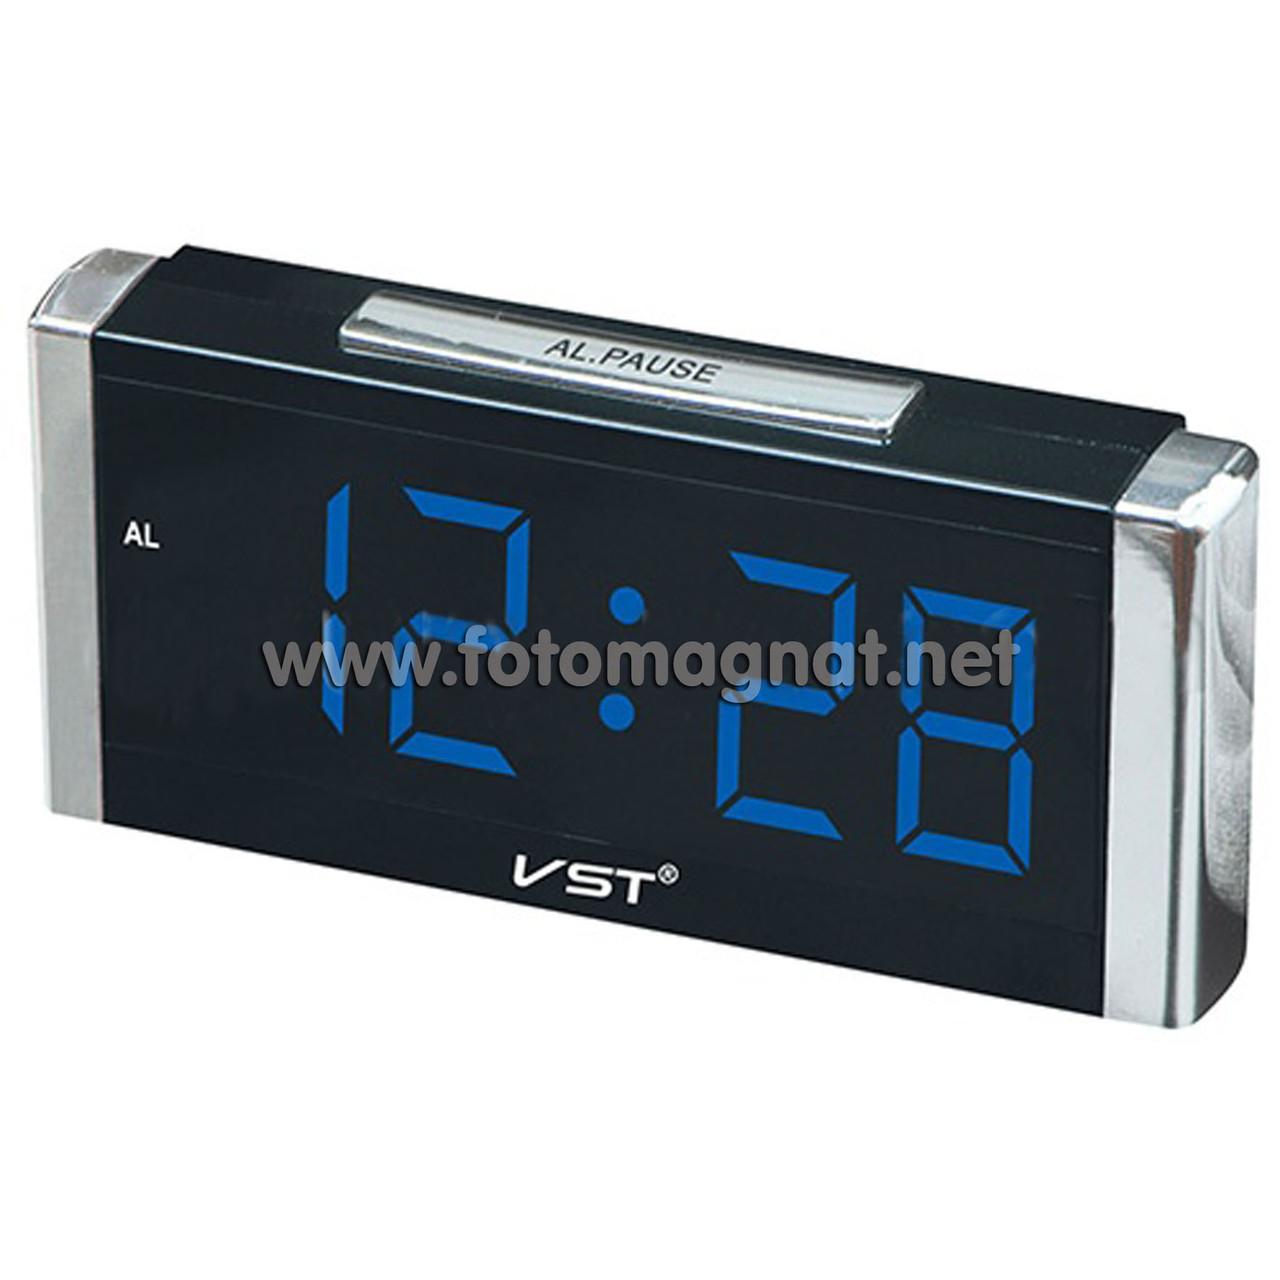 Часы сетевые  VST 731-5, Настольные электронные часы